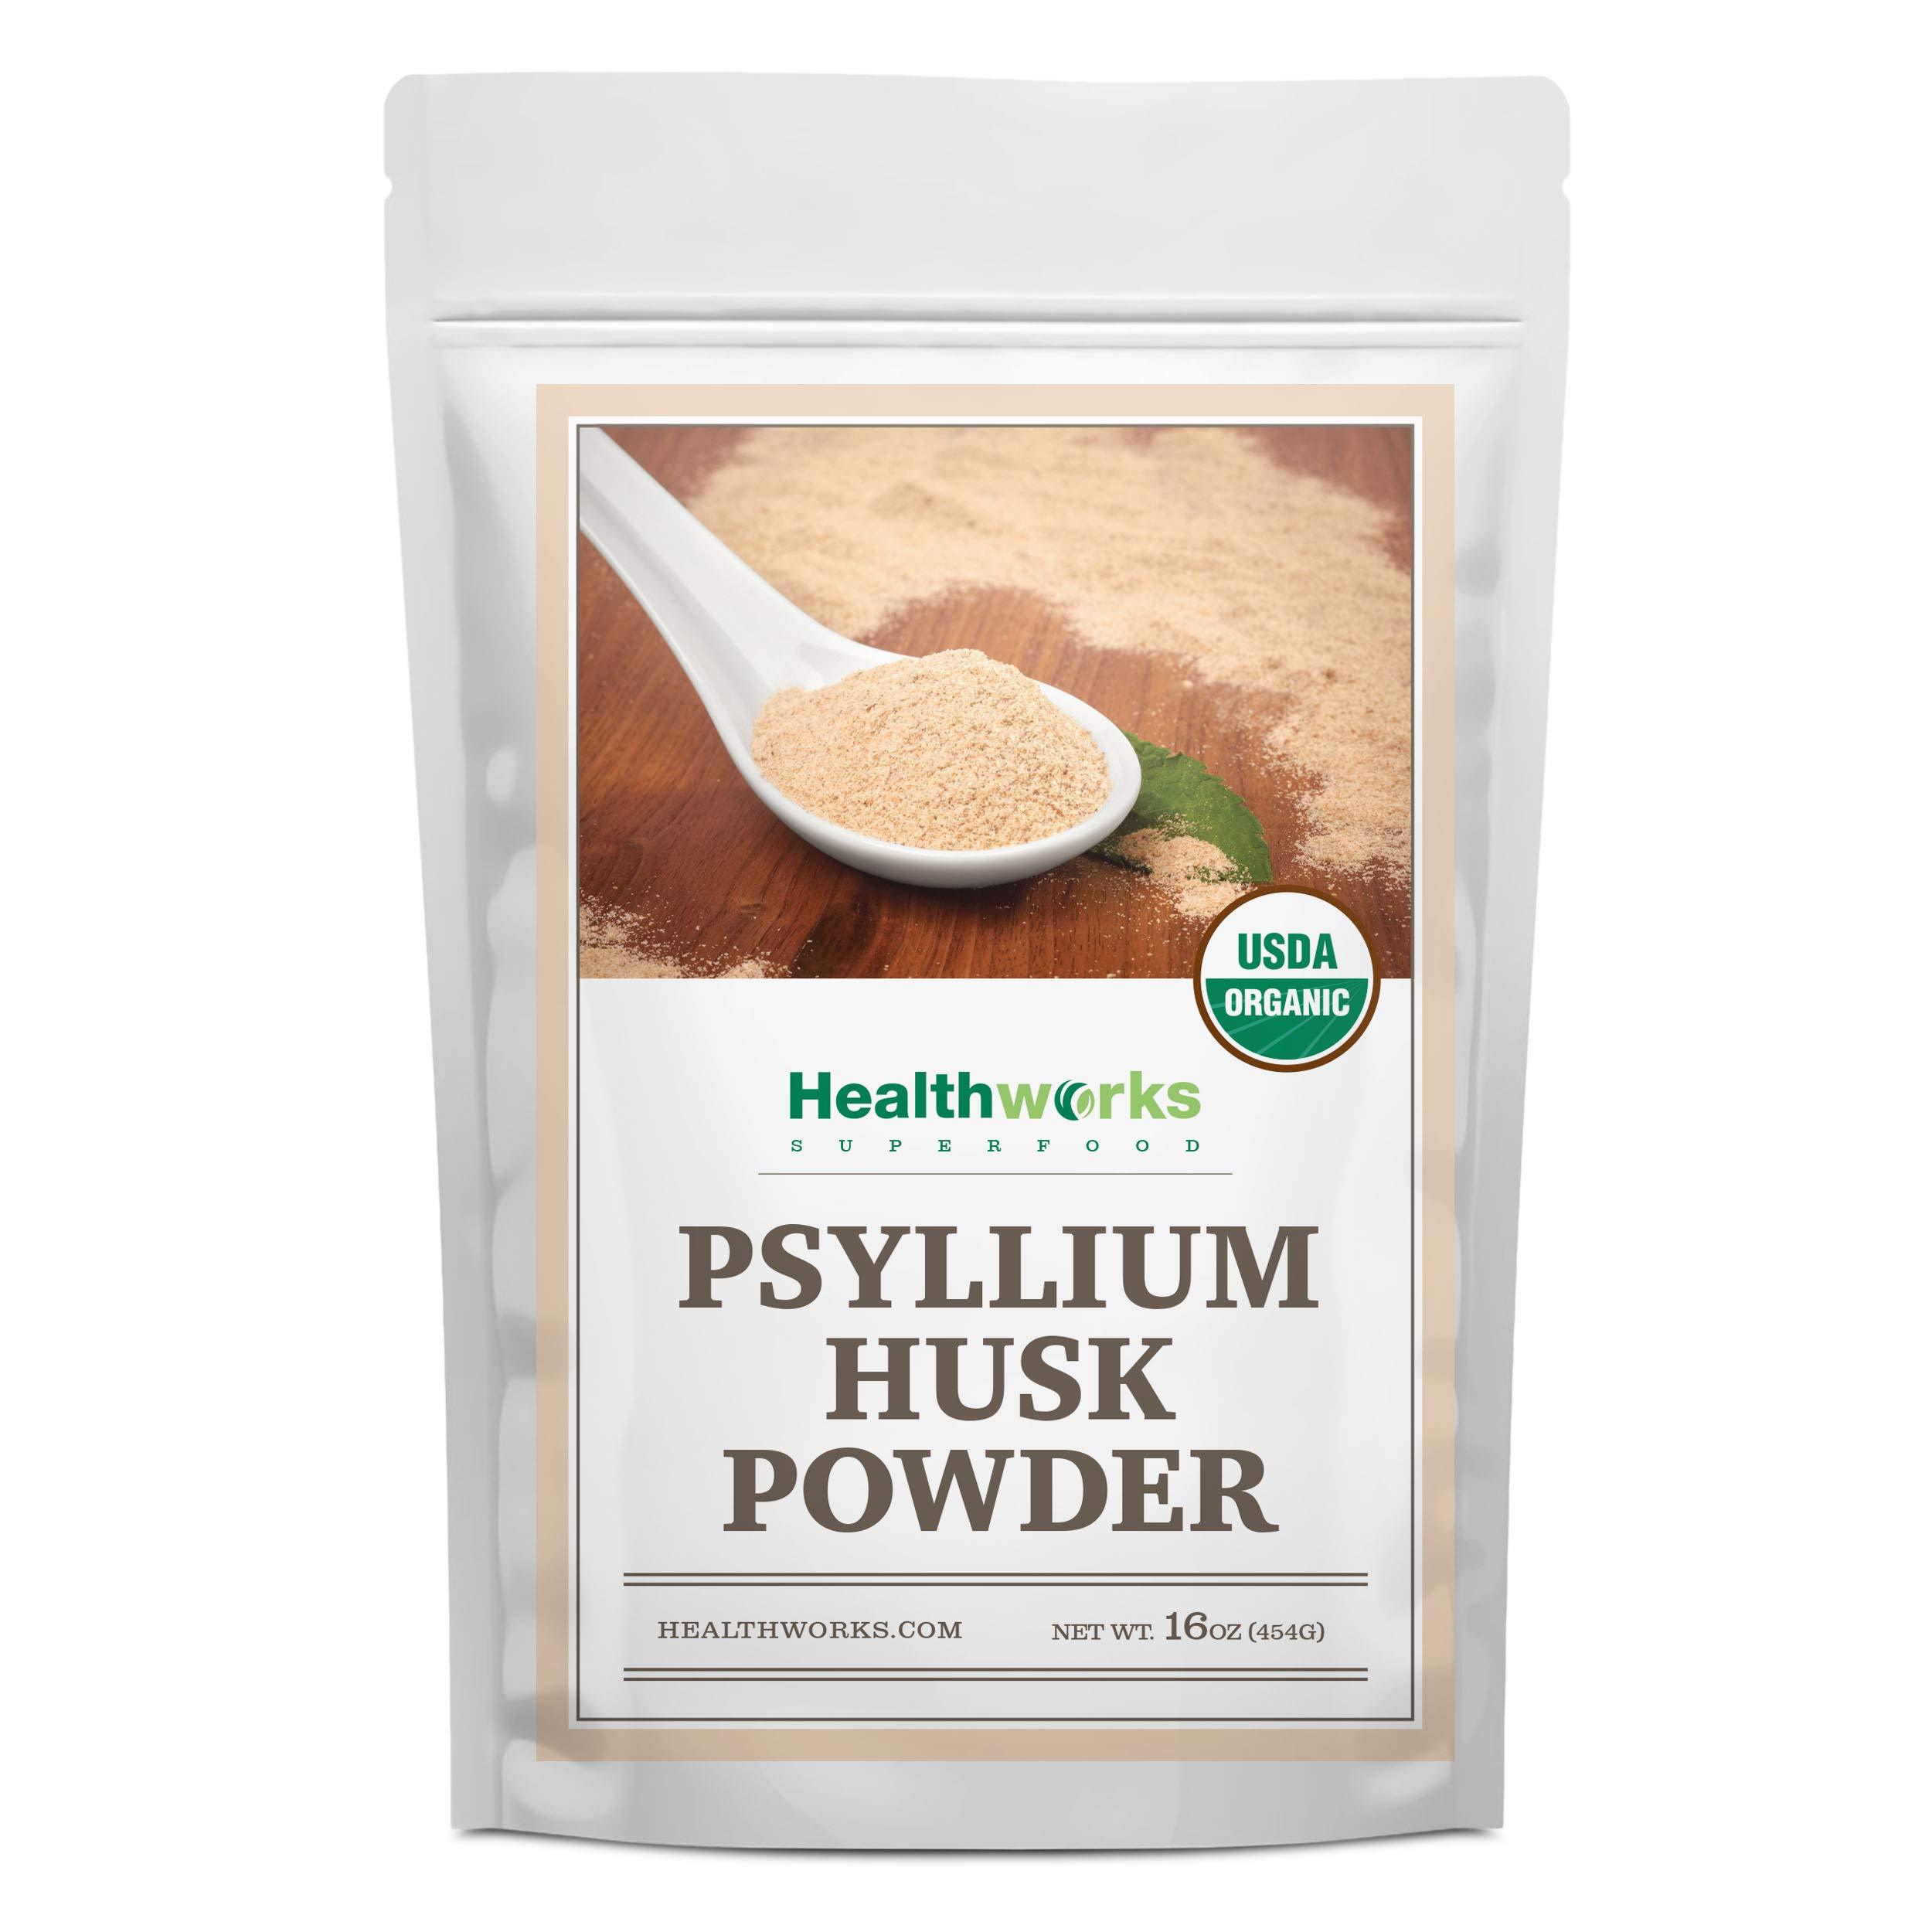 Healthworks Psyllium Husk Powder (16 Ounces / 1 Pound) | Raw | Certified Organic | Finely Ground Powder from India | Keto, Vegan & Non-GMO | Fiber Support by Healthworks